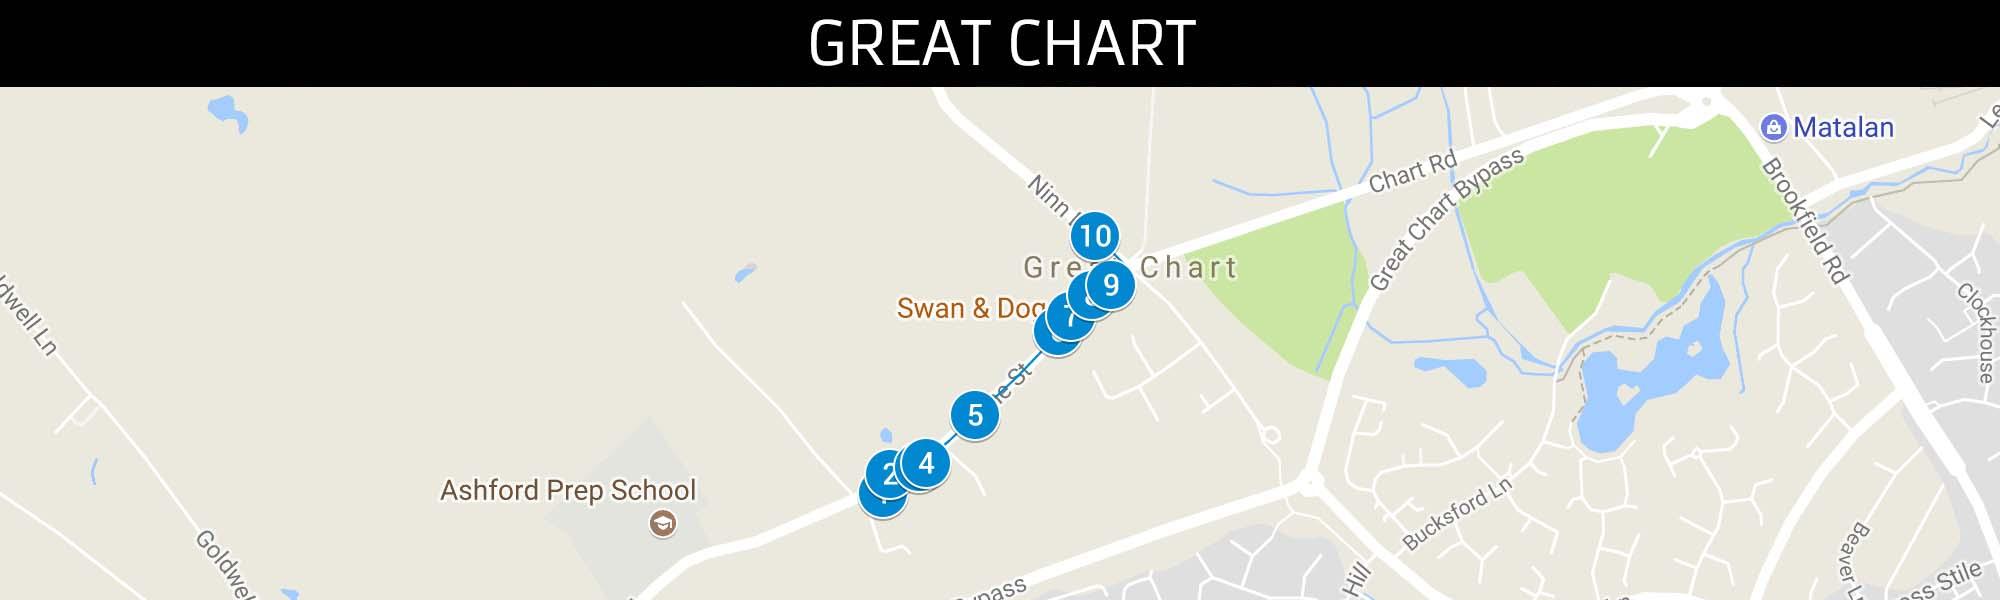 Great Chart Trail